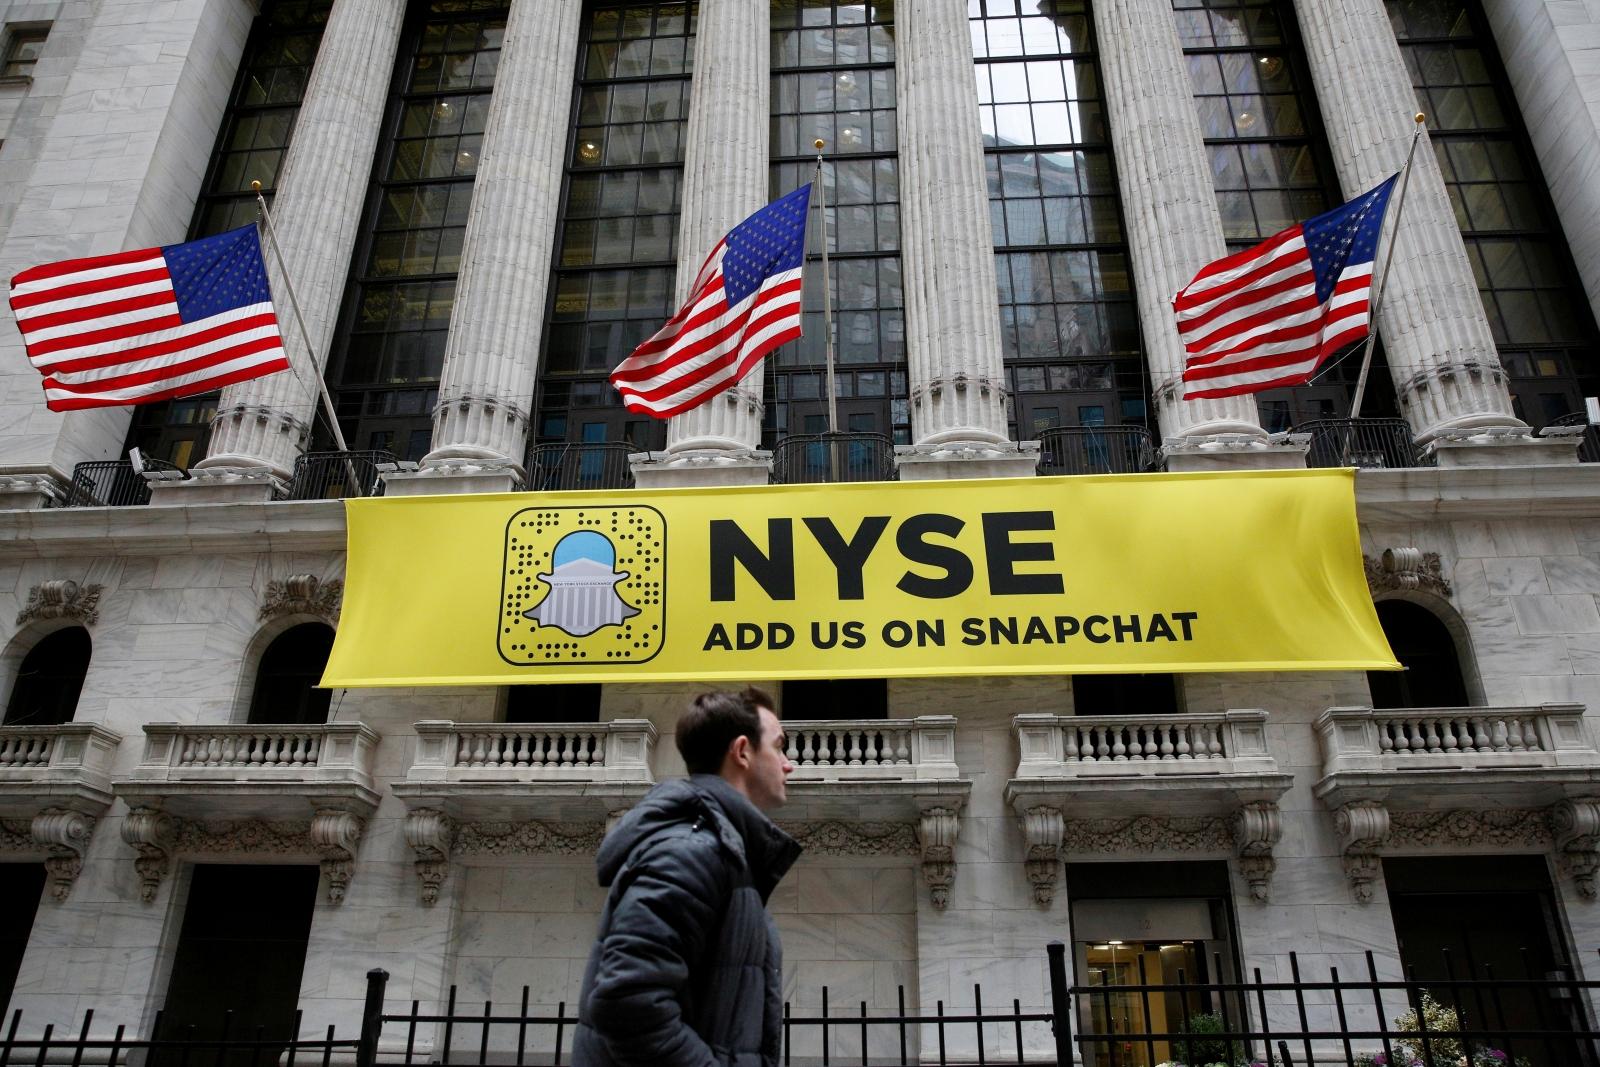 NYSE on Snapchat